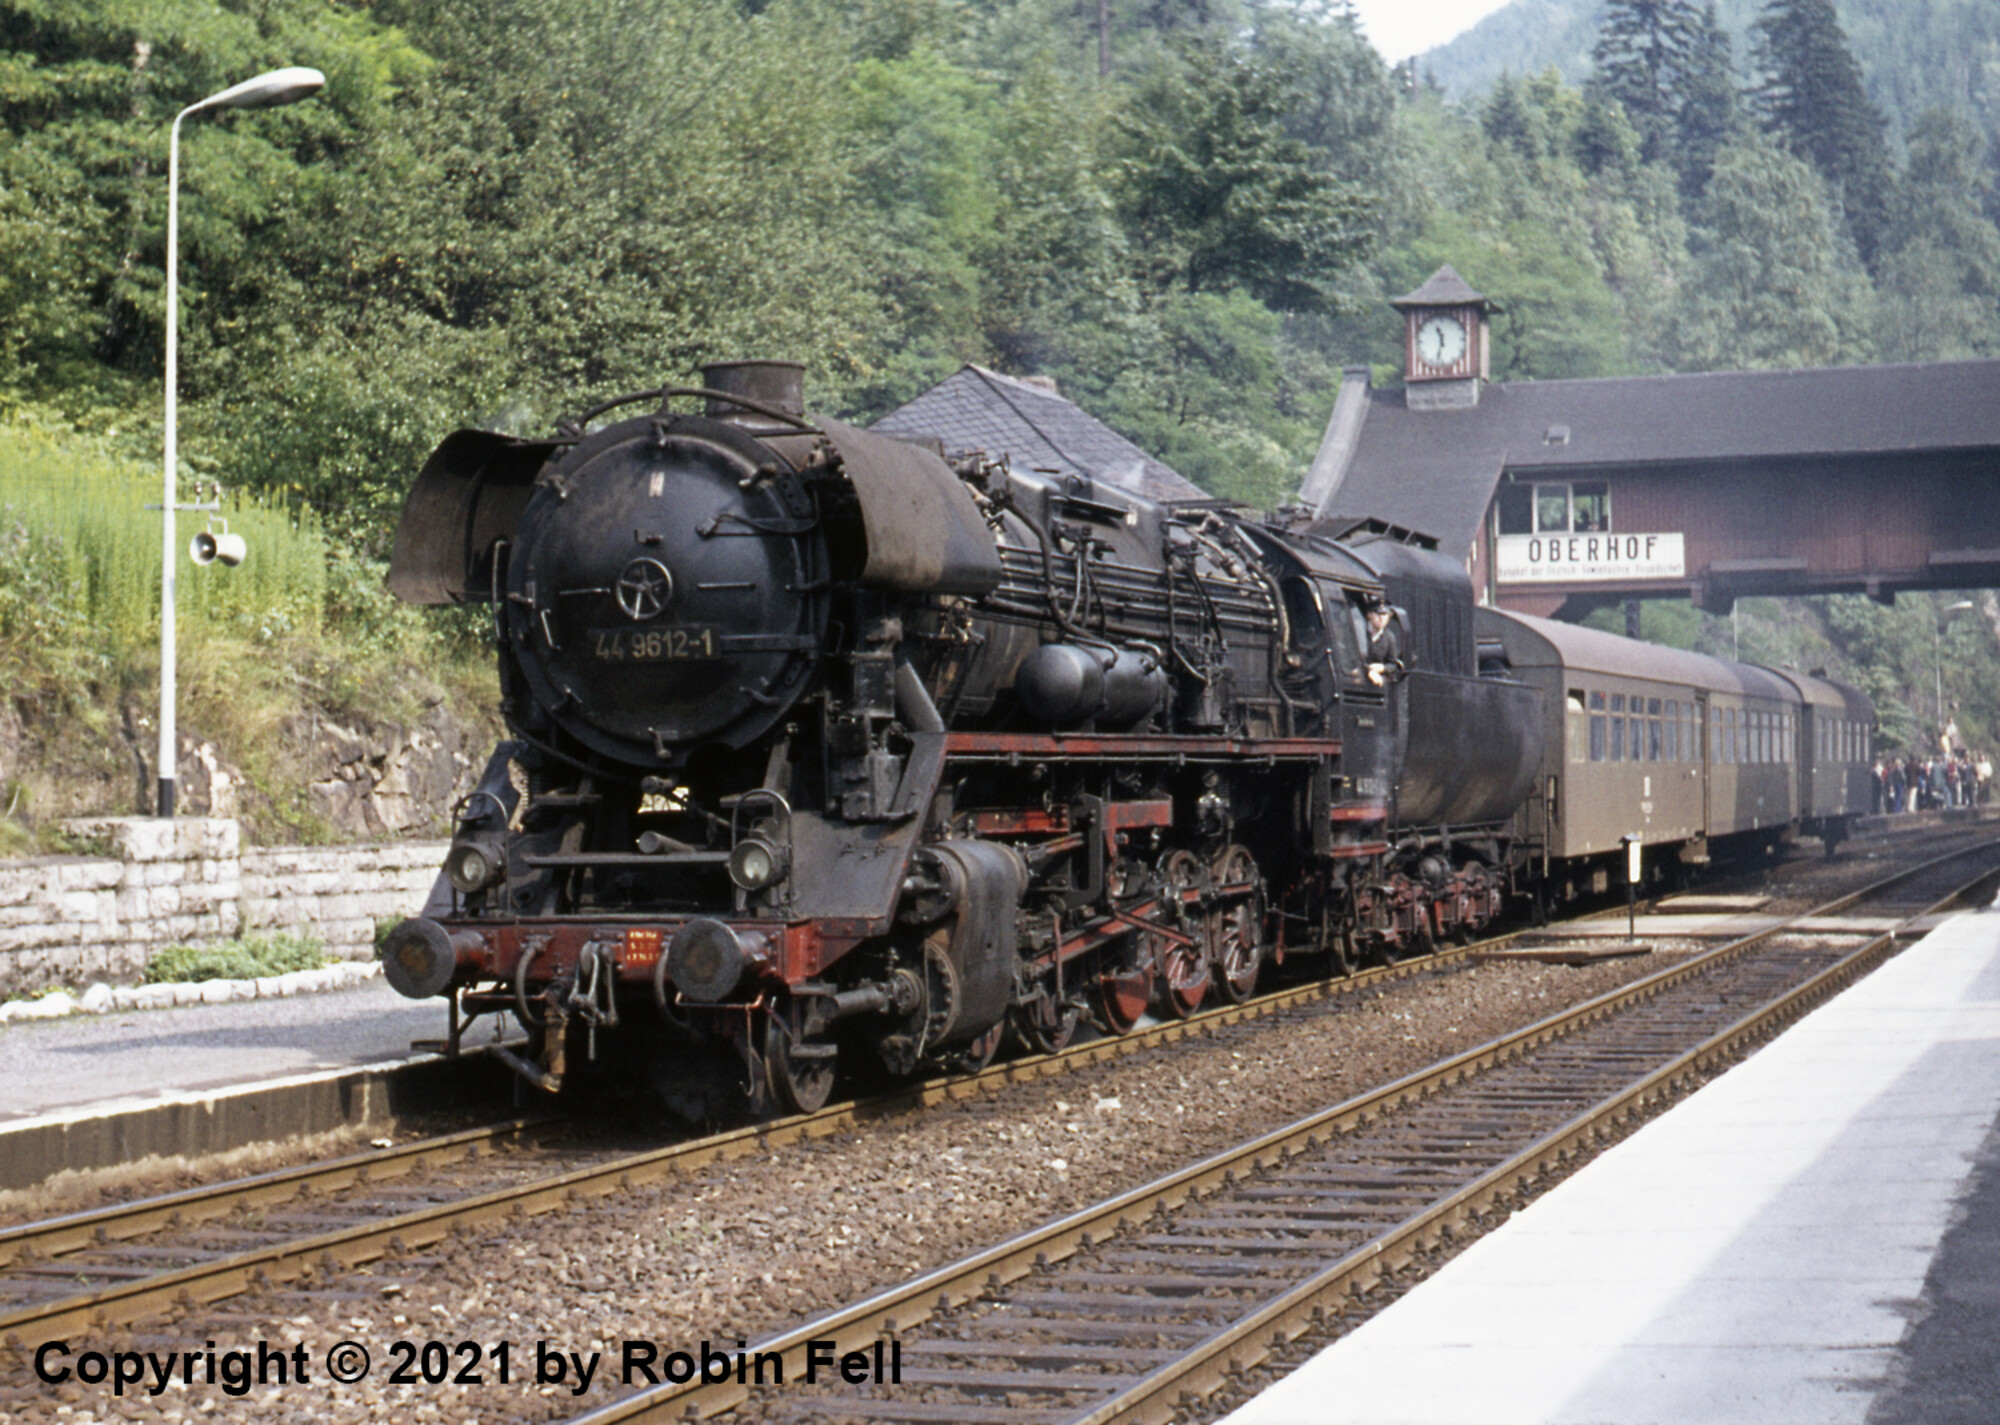 Trix 16443 Dampflokomotive Baureihe 44.9 Dampflokomotive Baureihe 44.9